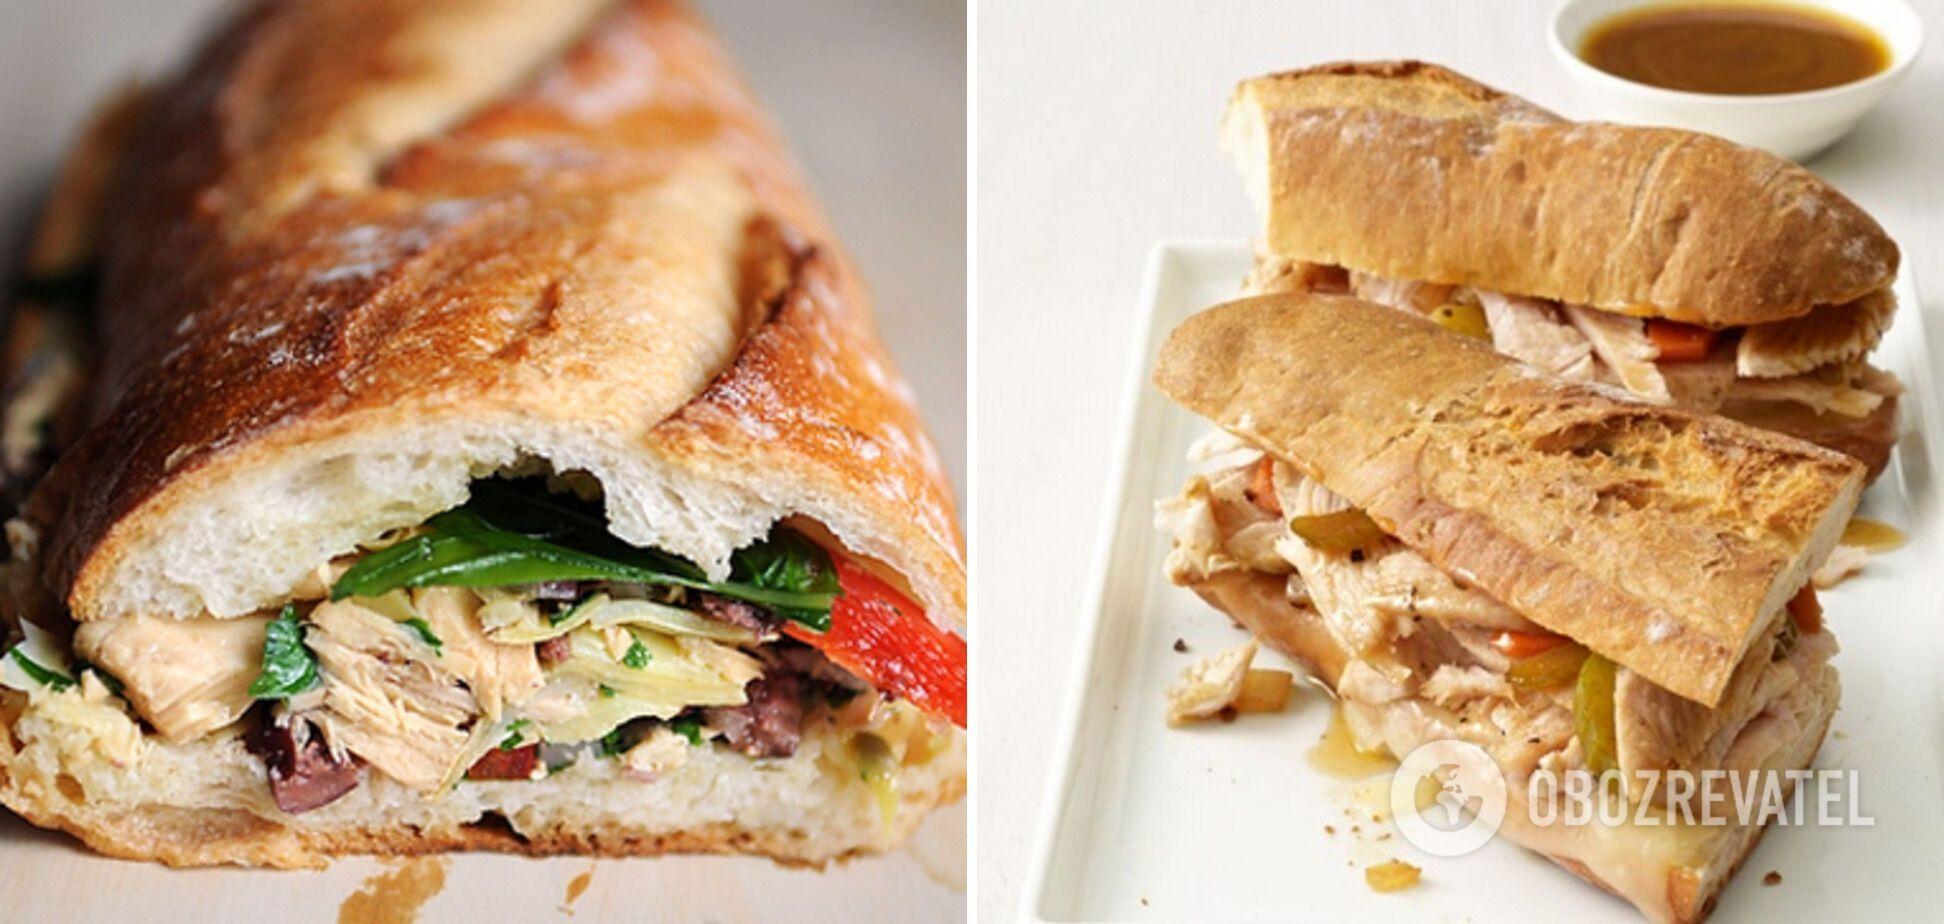 Сэндвич с курицей и шампиньонами